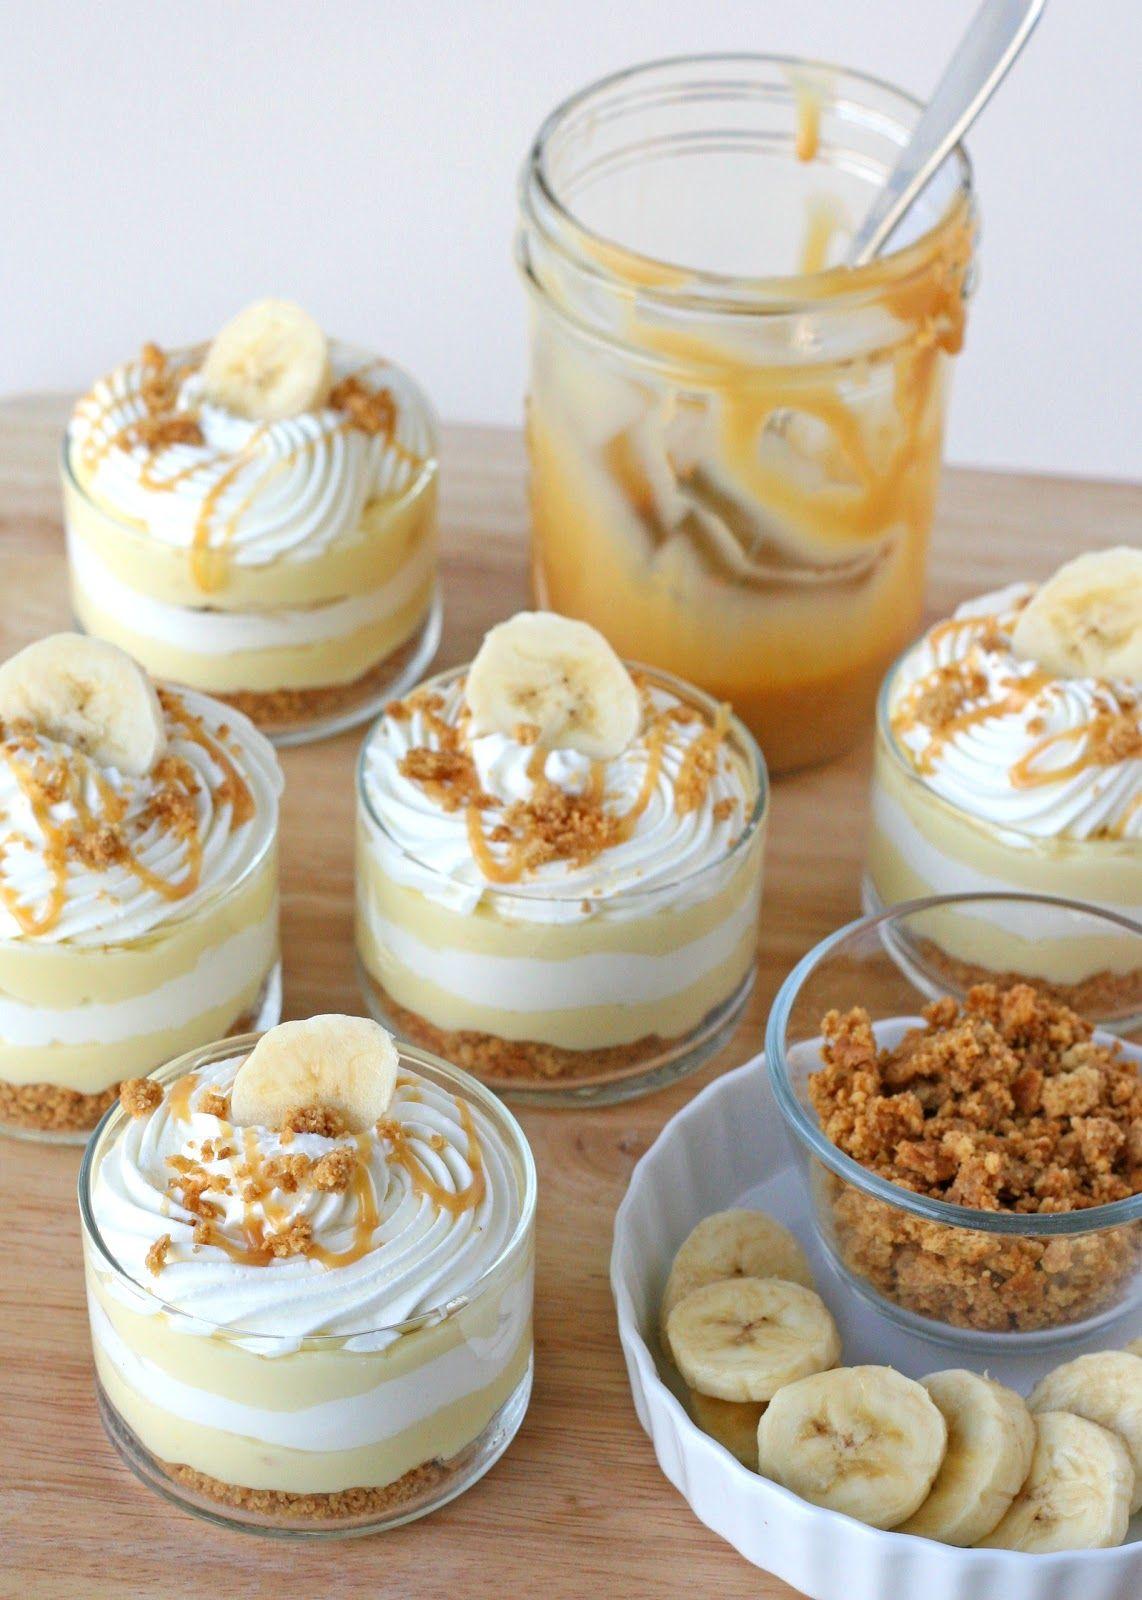 Banana caramel cream dessert glorious treats desserts